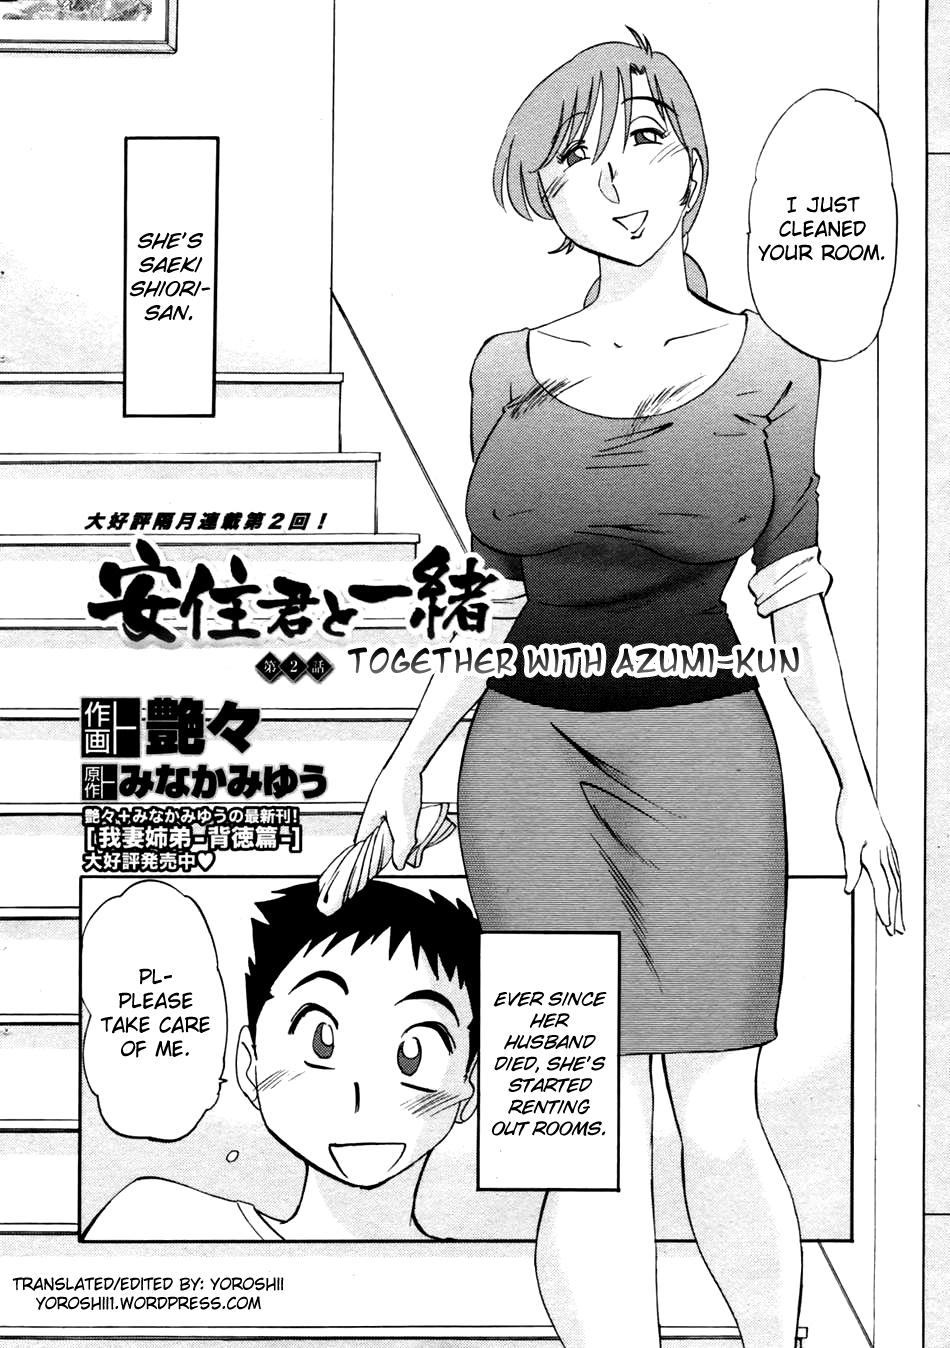 001 azumi kun to issho